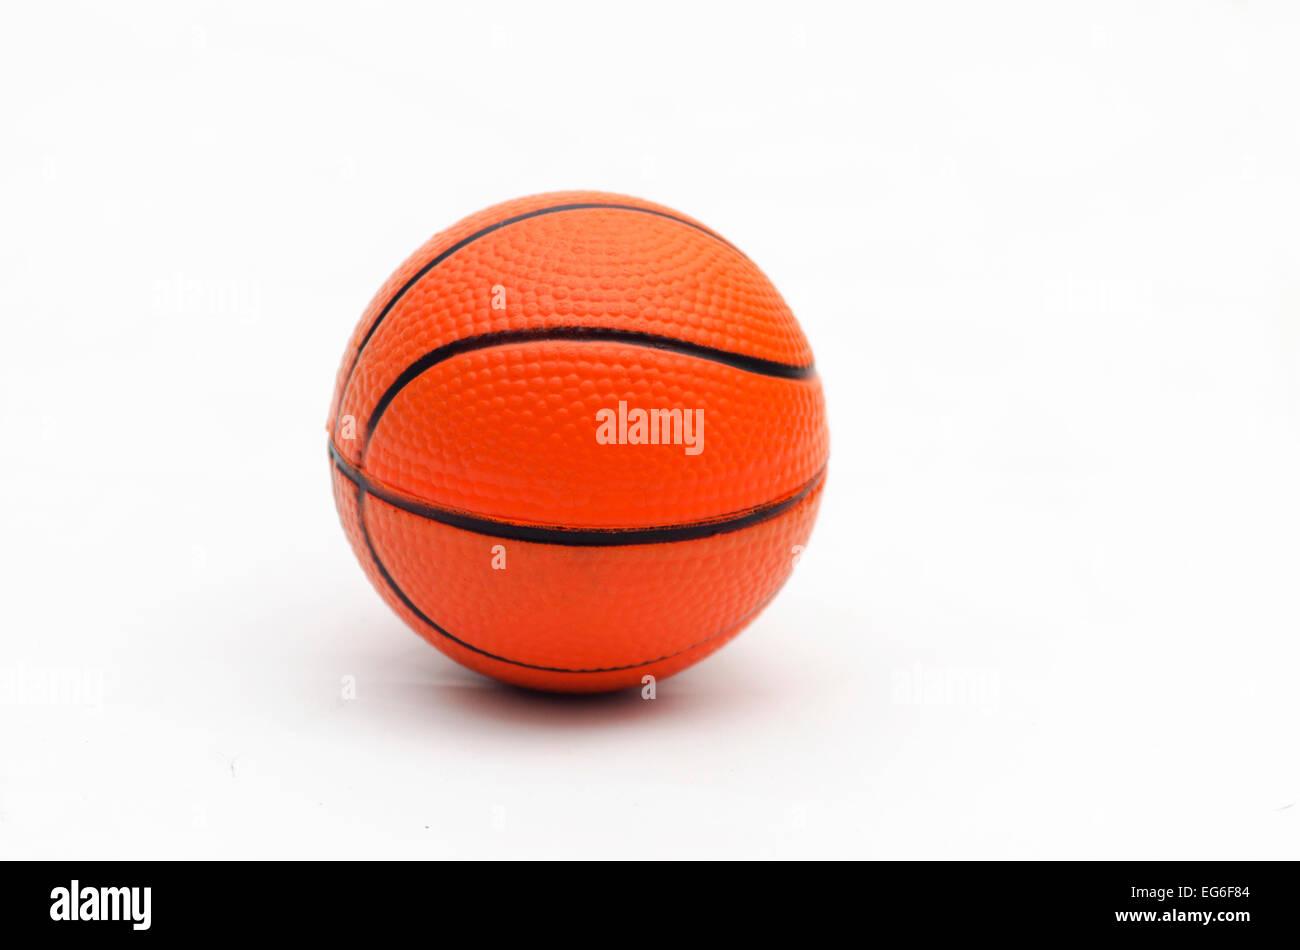 Basket Ball orange sur fond blanc Photo Stock